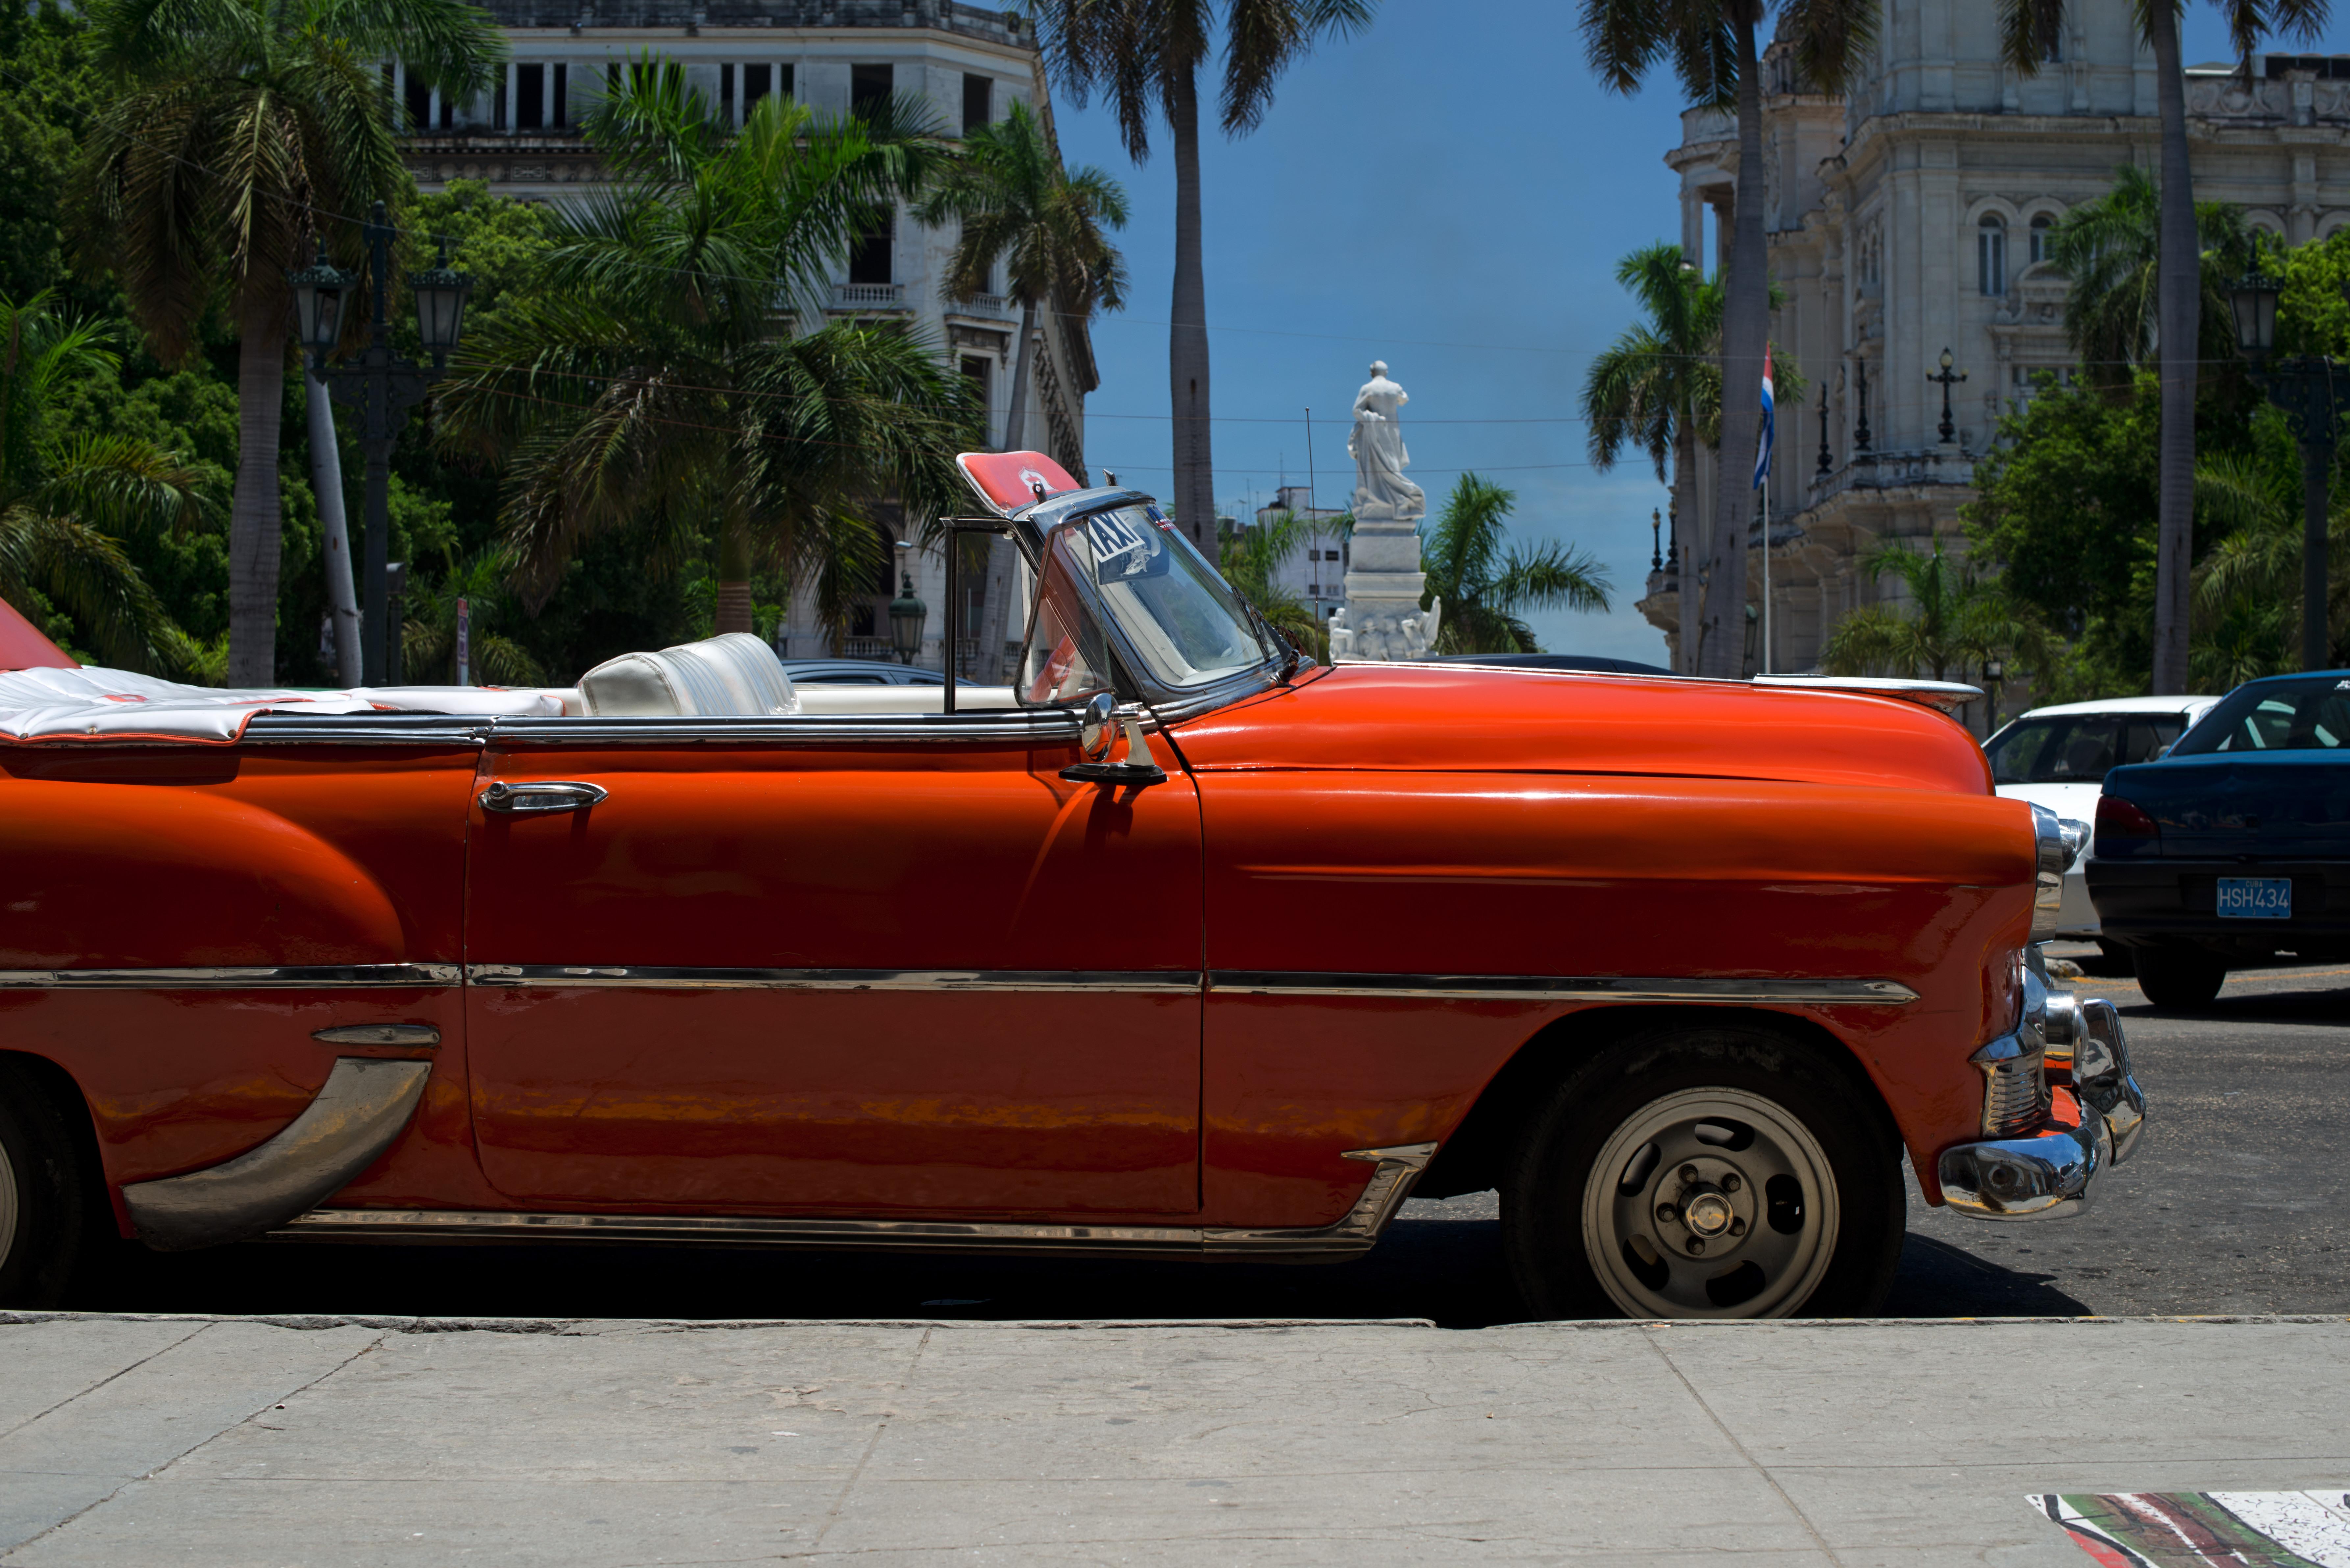 Habana_taxi_Inglaterra_2820Habana_taxi_Inglaterralow